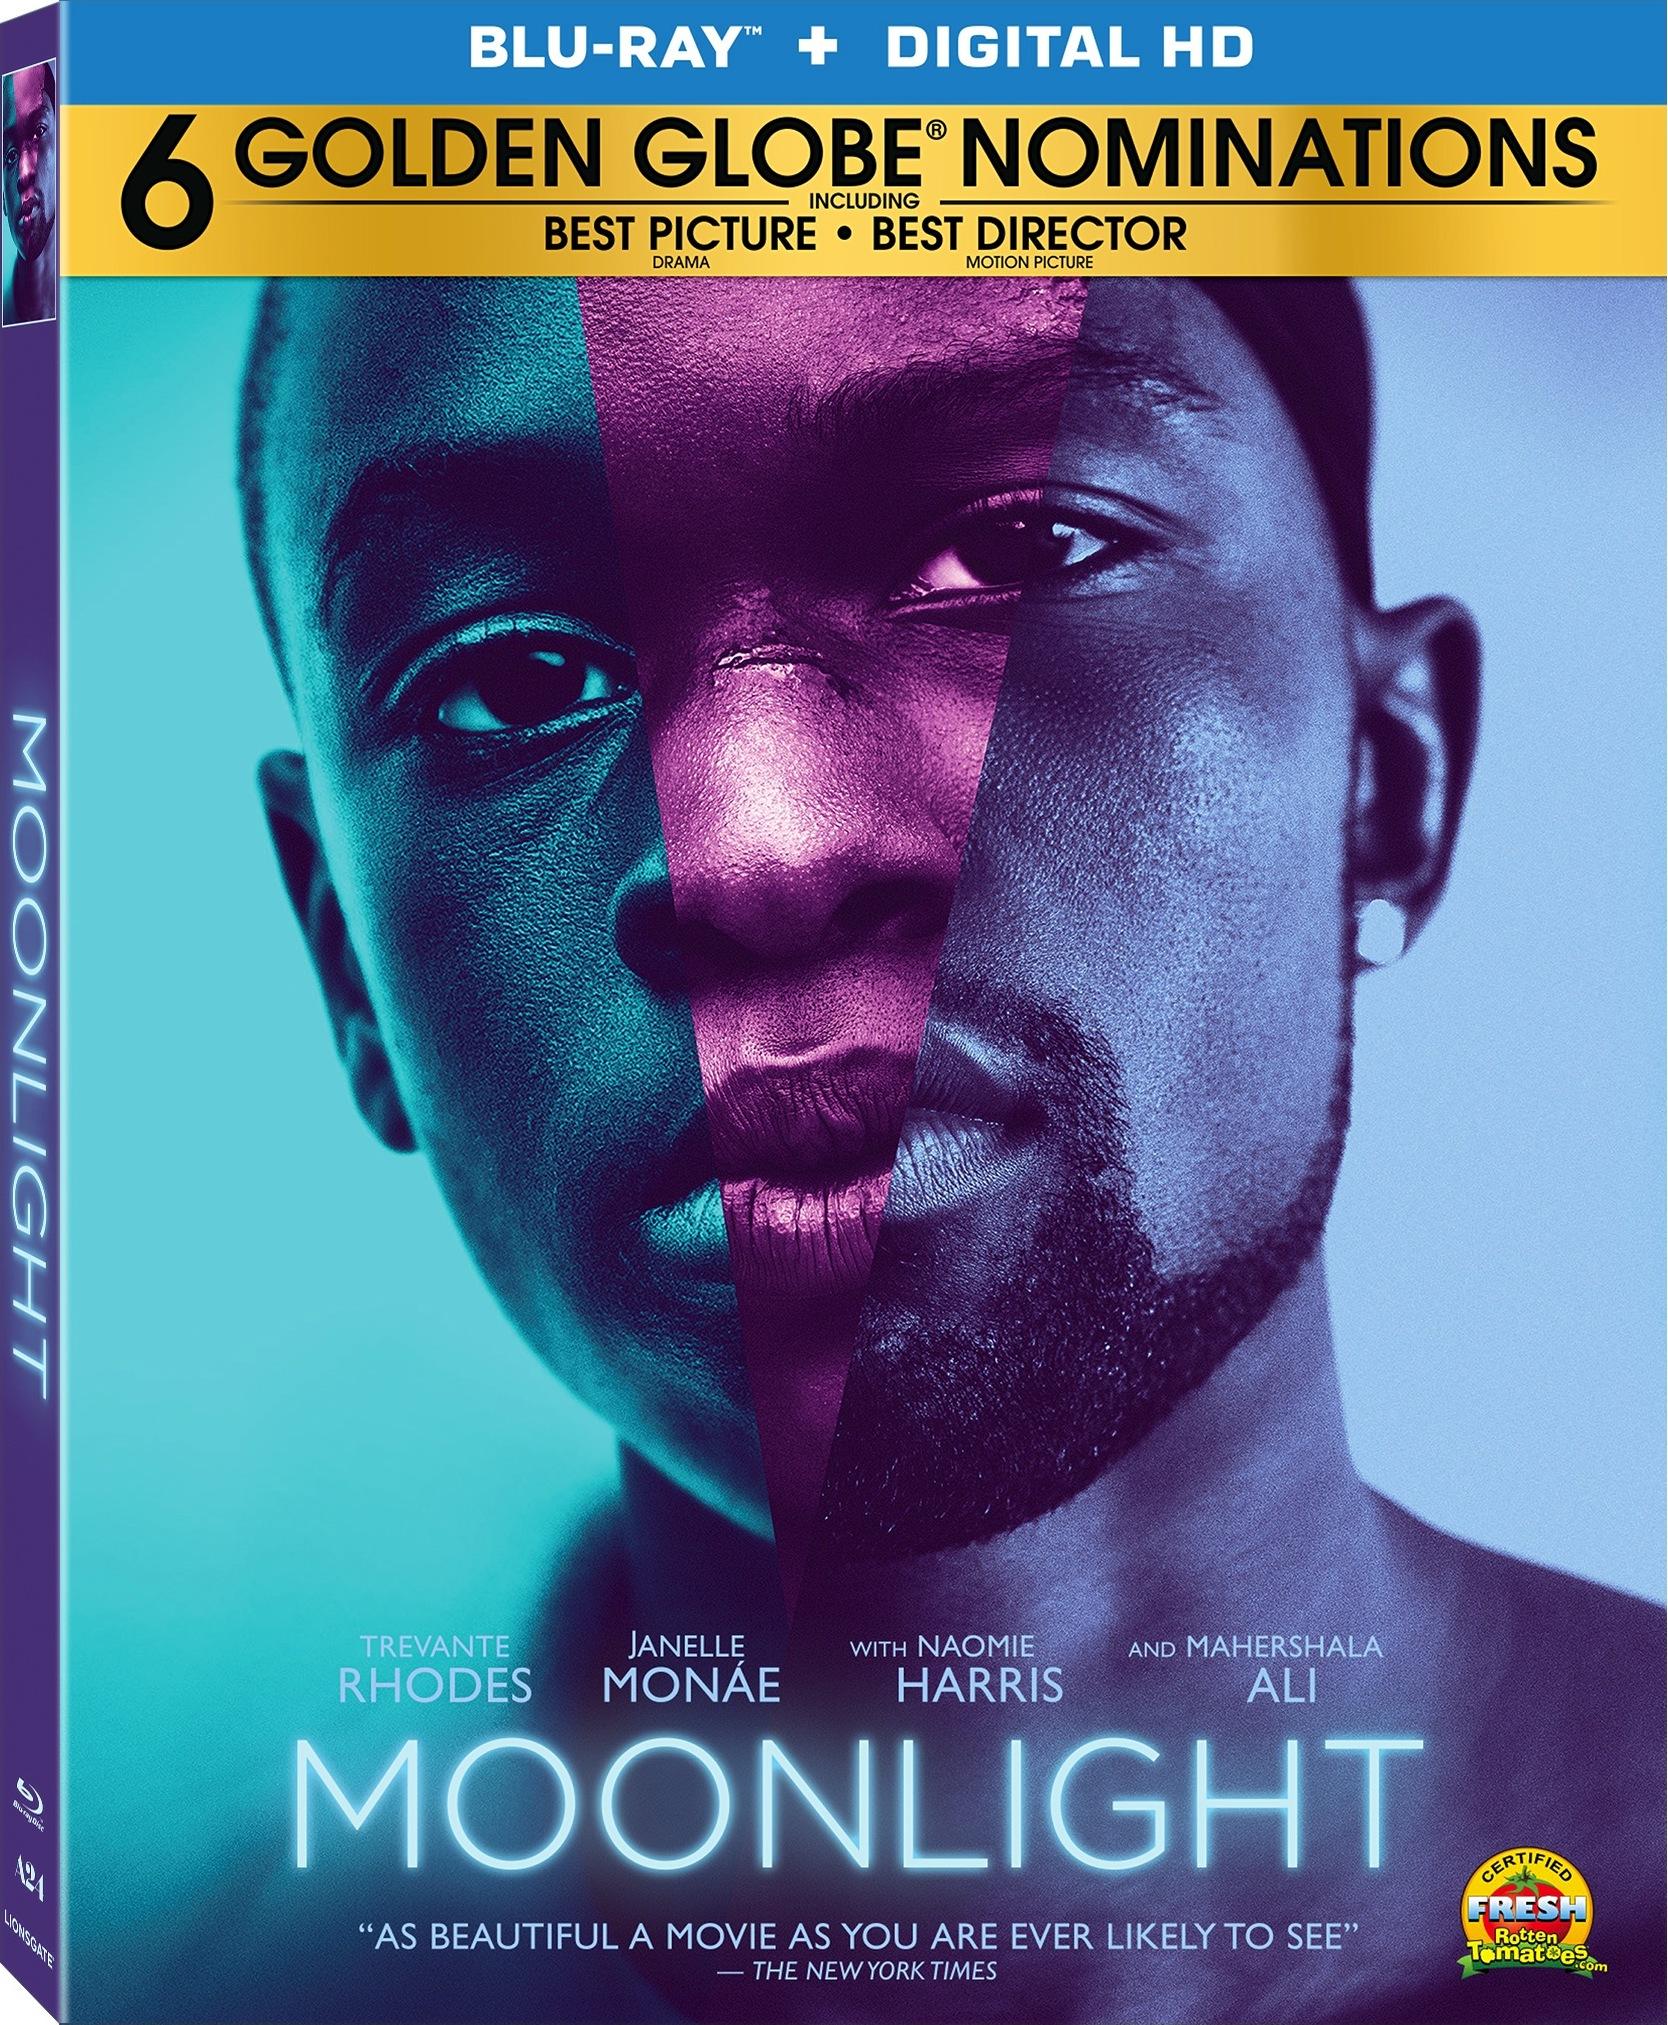 Moonlight (2016) poster image